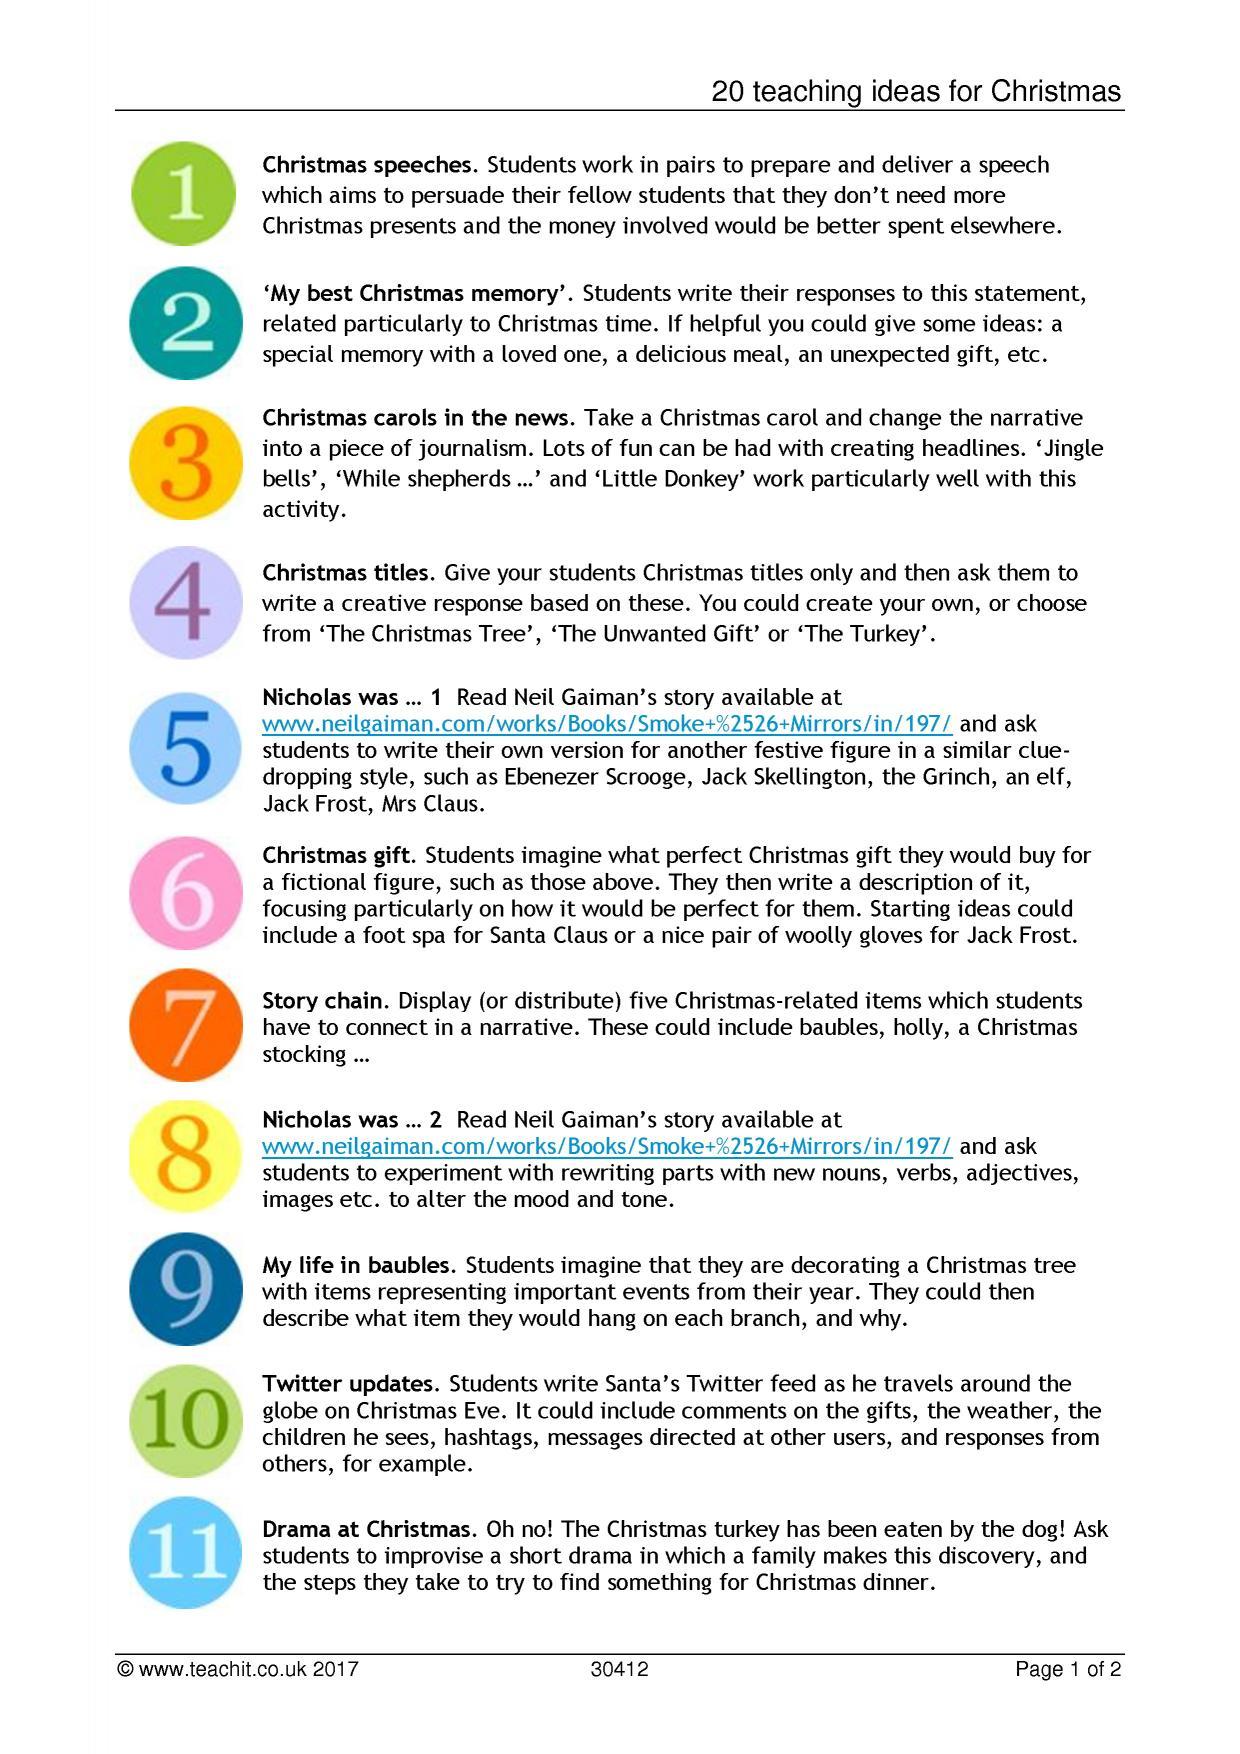 20 teaching ideas for christmas resource thumbnail